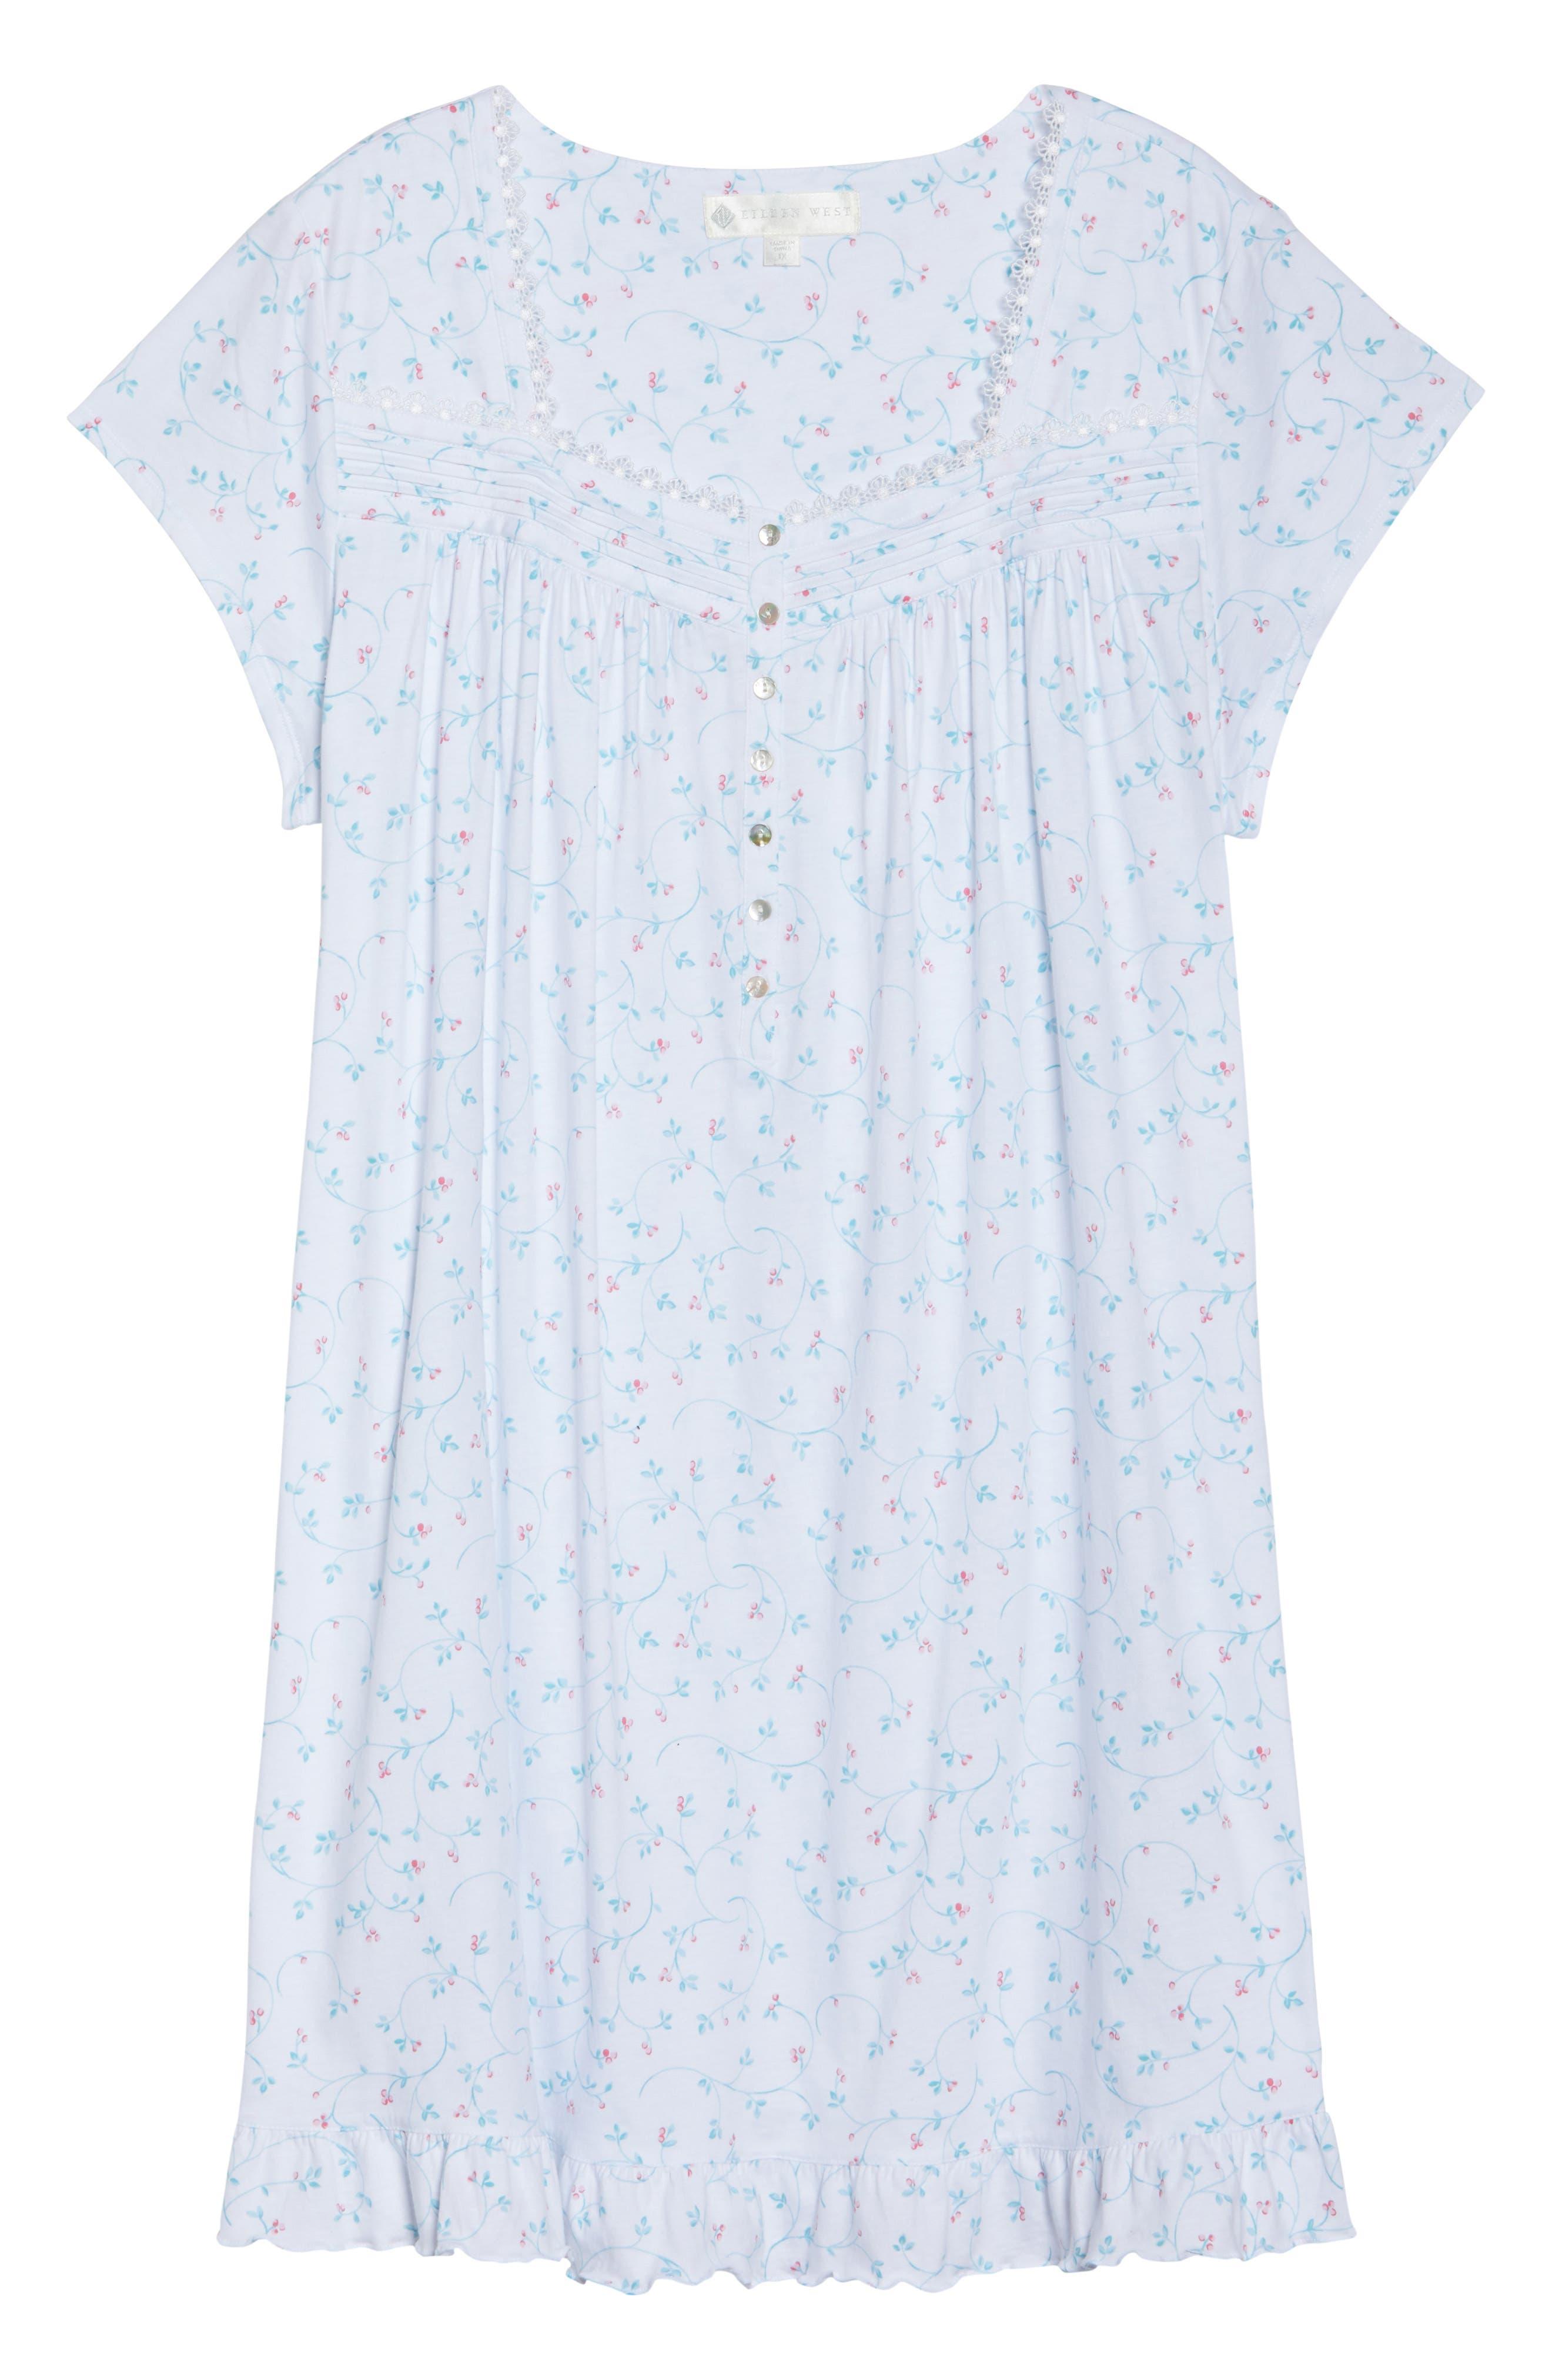 Cotton Jersey Short Nightgown,                             Alternate thumbnail 4, color,                             White Aqua/ Pink Berries